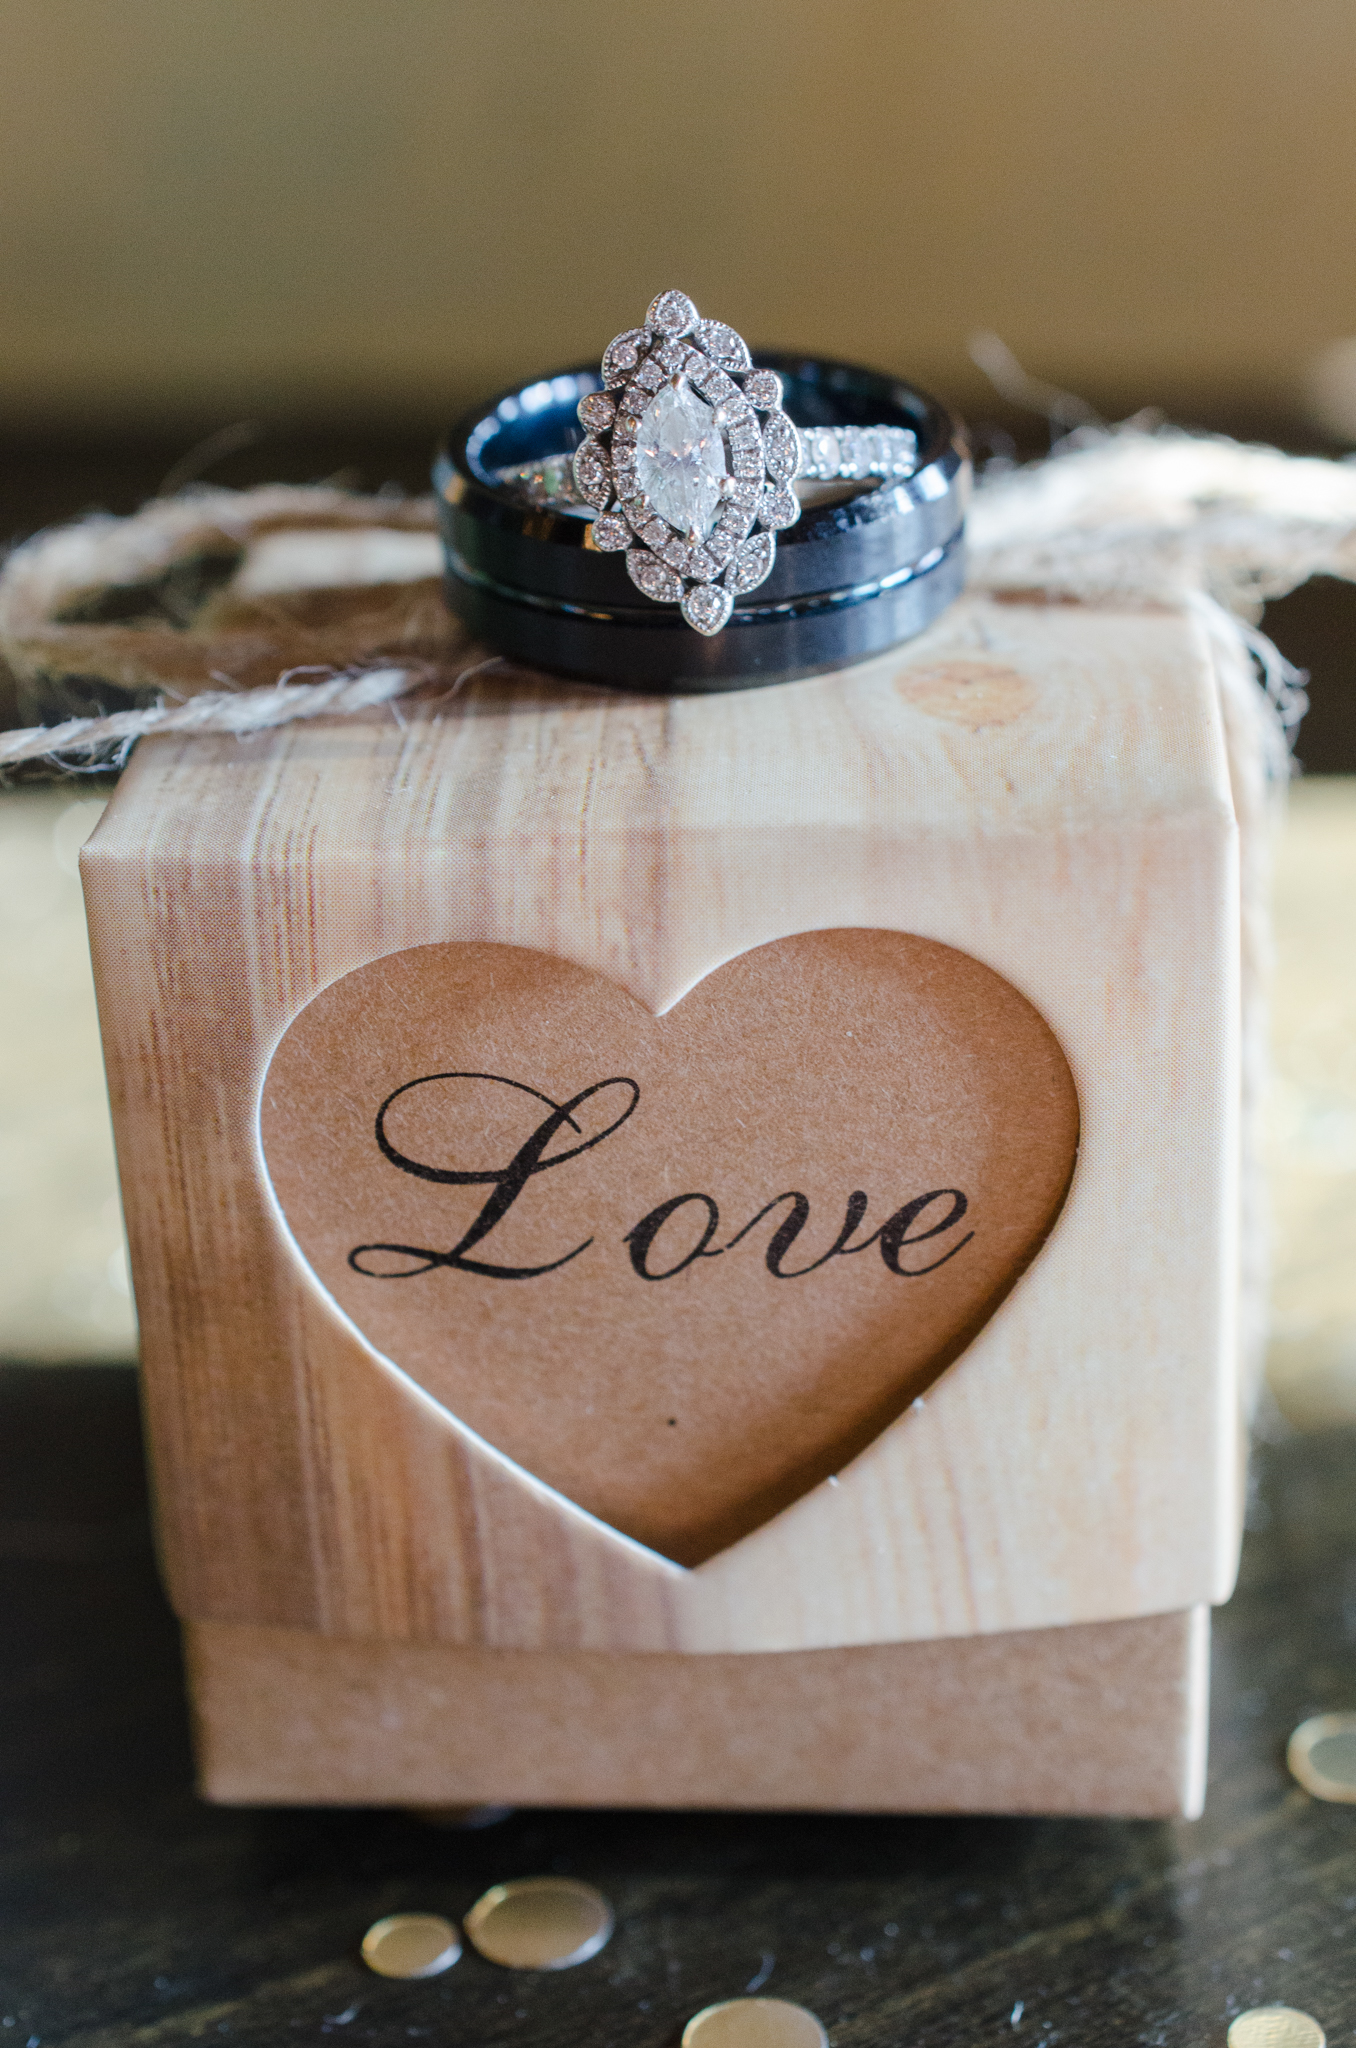 wedding rings, wedding details, Josephina Event Venue, Dry Ridge, Louisville, Lexington, Somerset, Ashland, Morehead, Winchester, Mt Sterling, West Chester